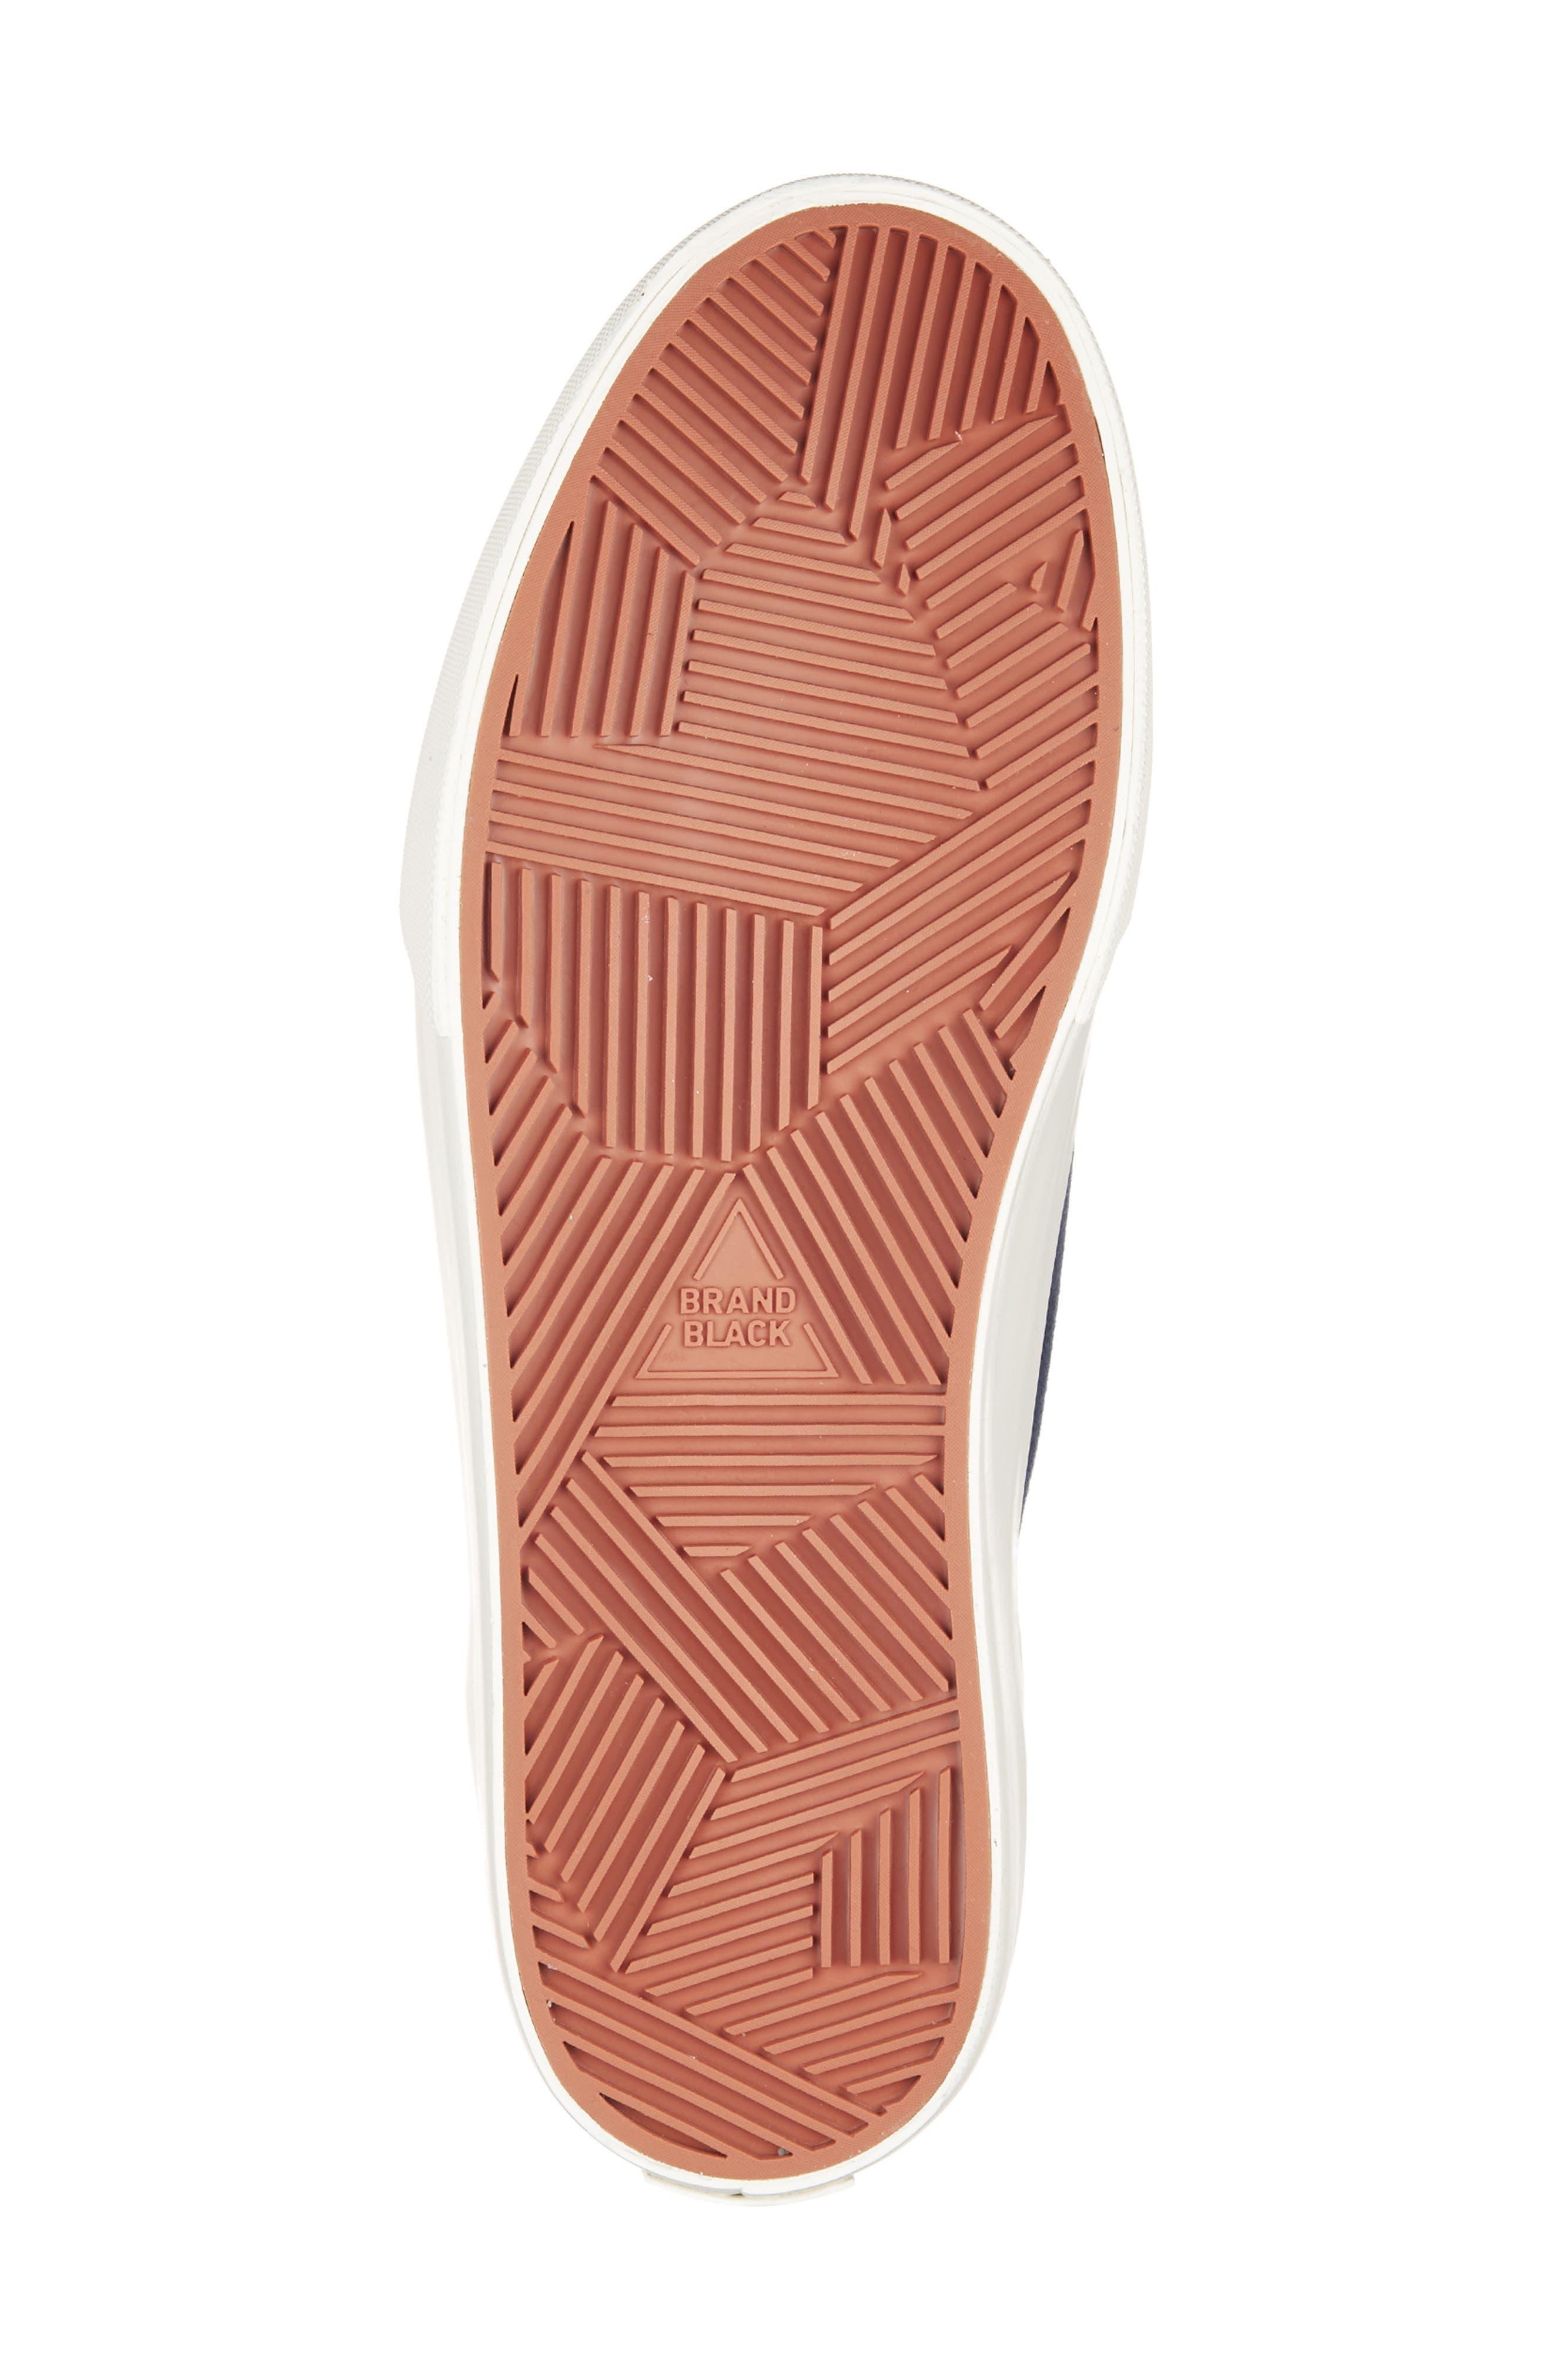 Vesta Low Top Sneaker,                             Alternate thumbnail 6, color,                             Navy